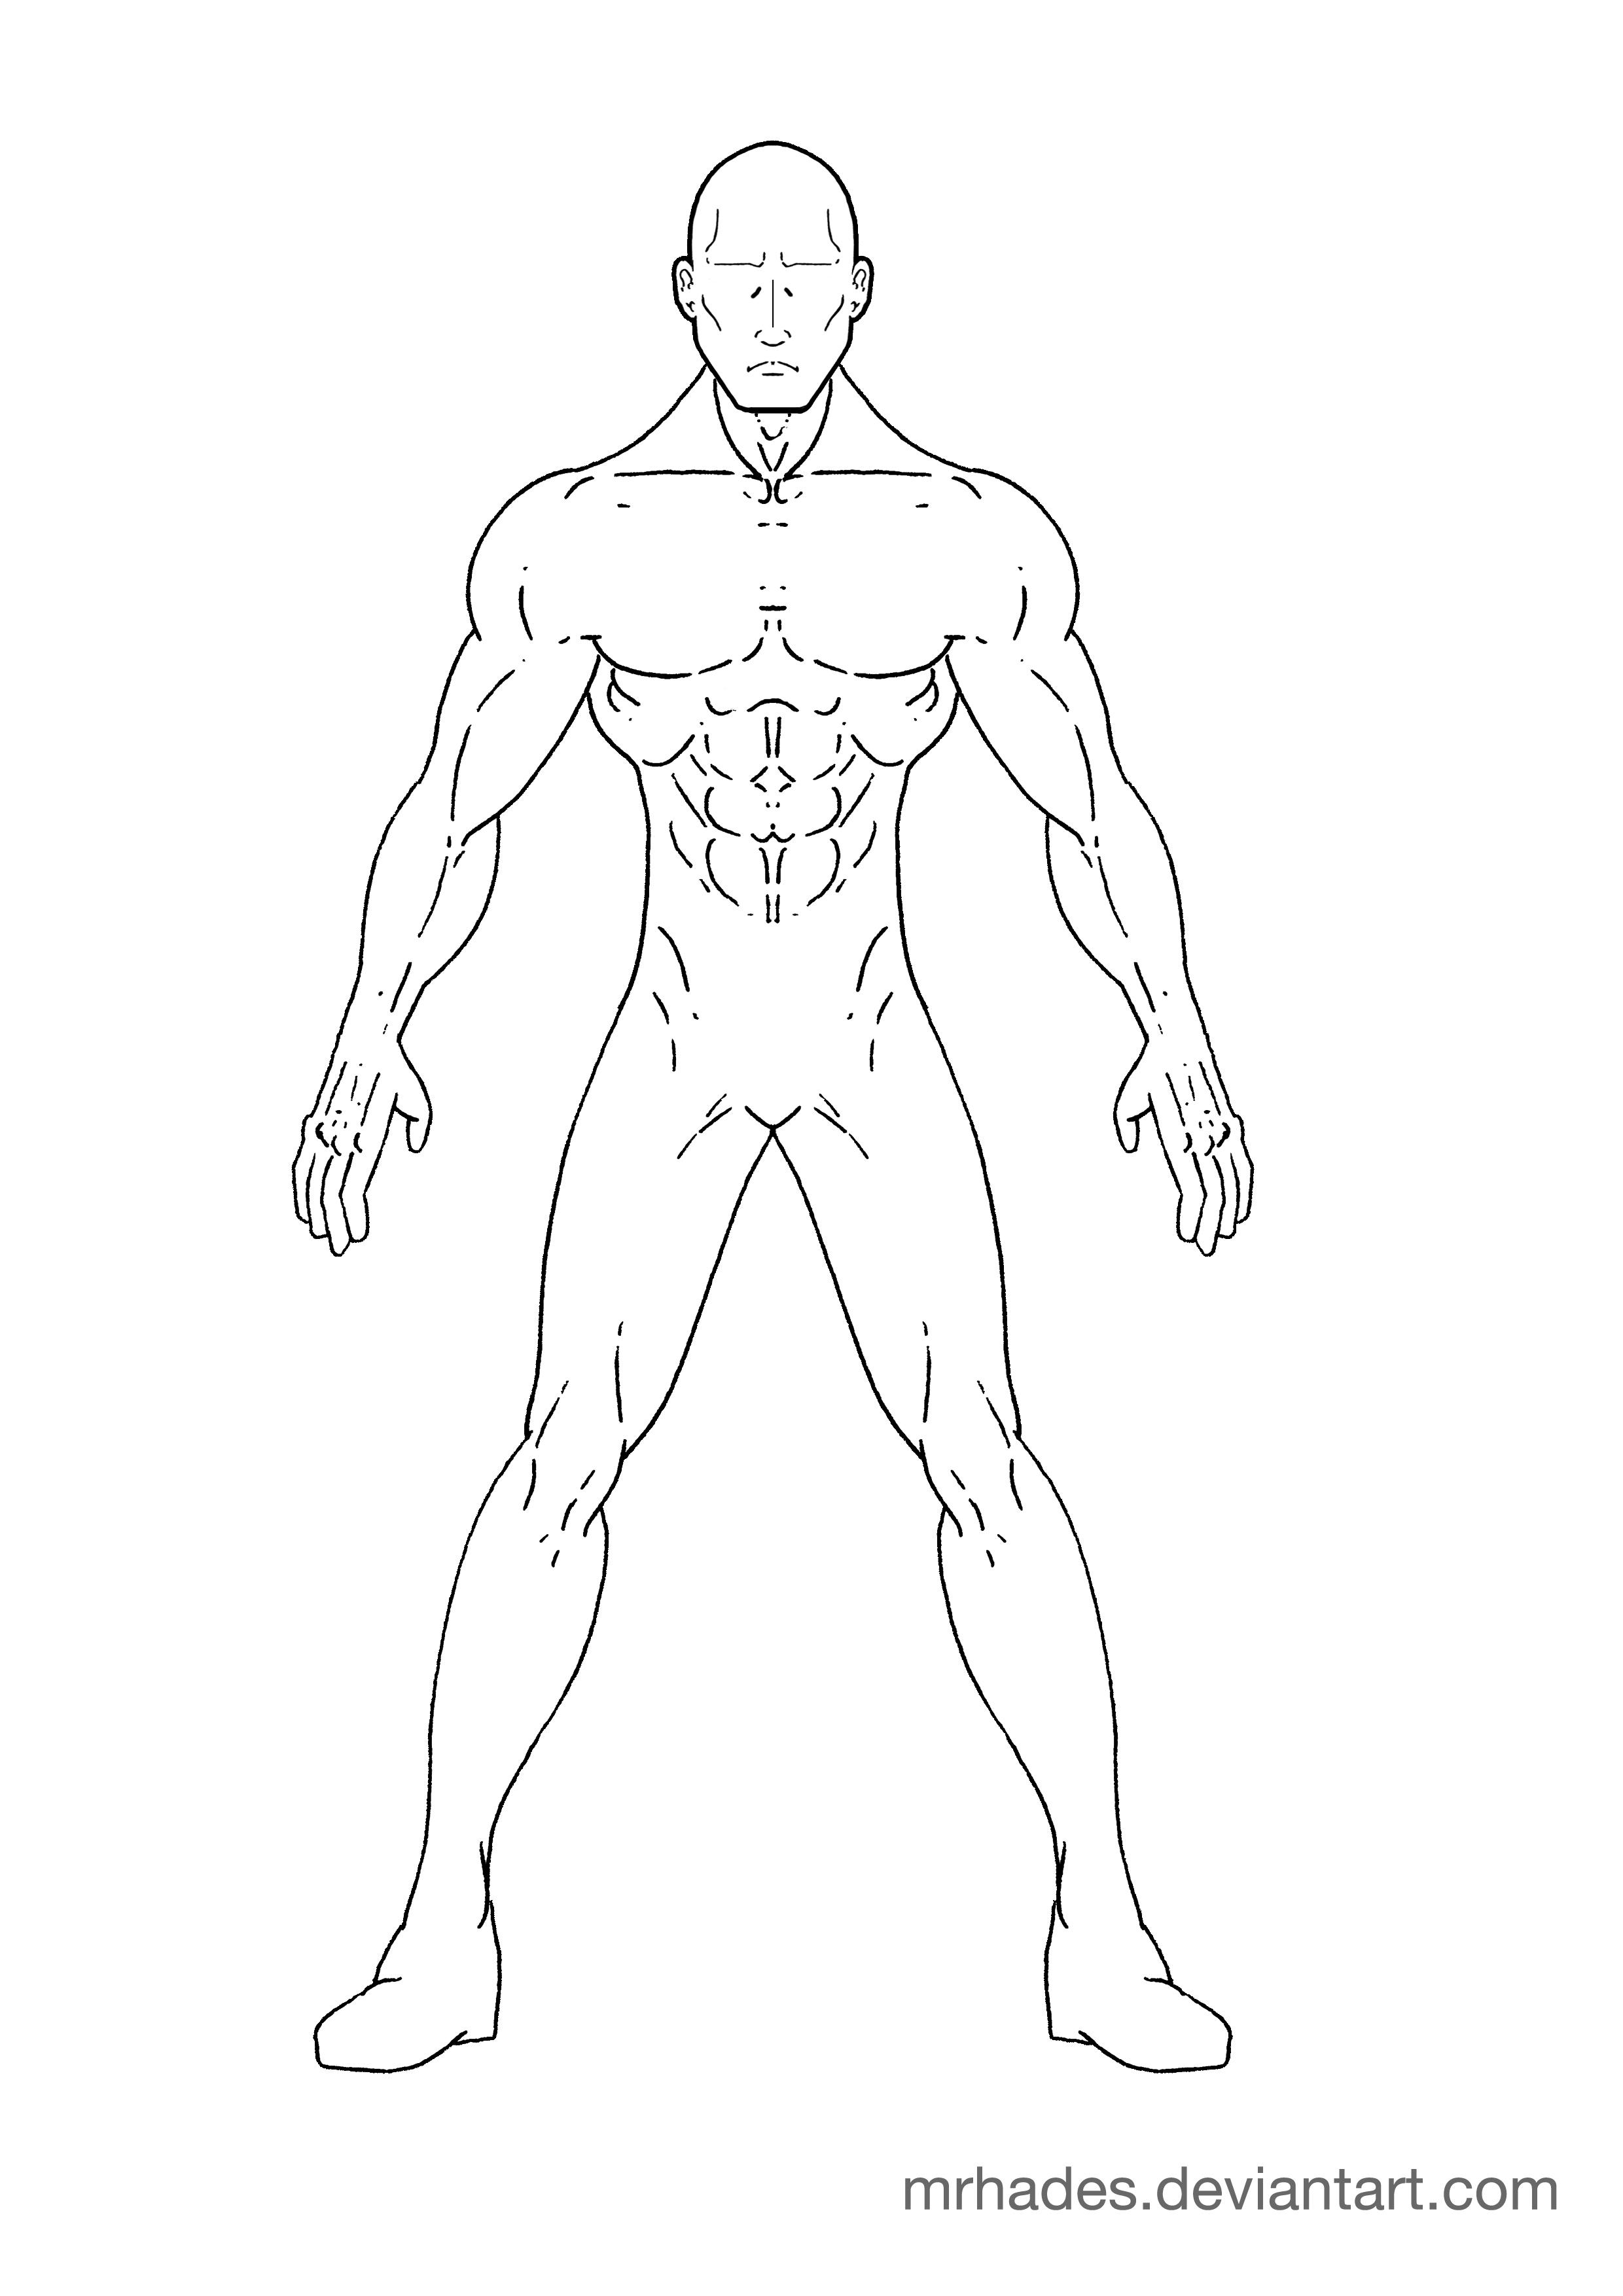 superhero template creator - Monza berglauf-verband com